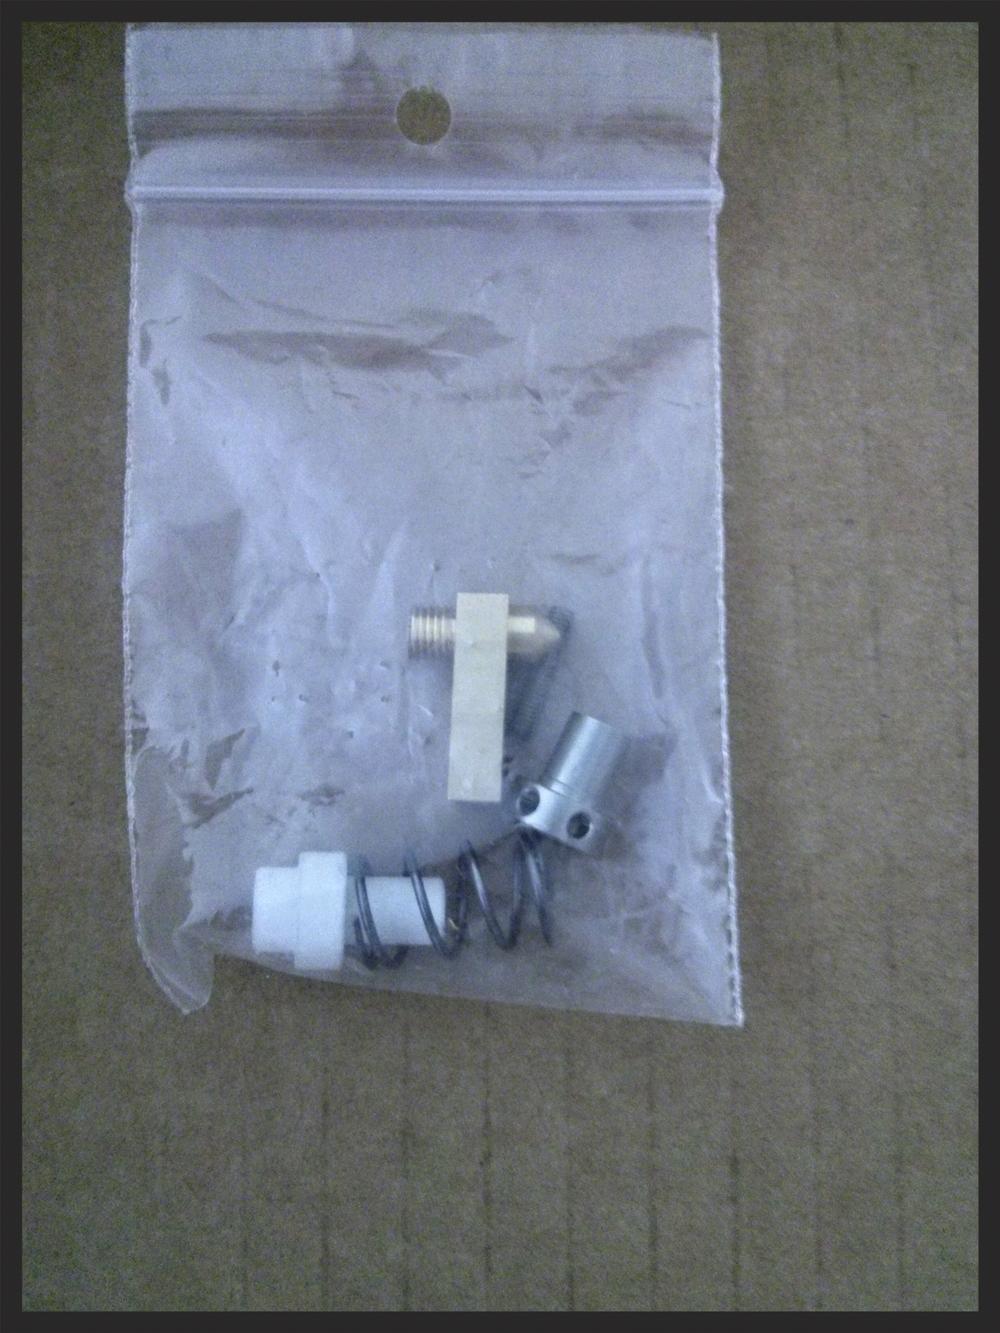 Extra Nozzle Kit